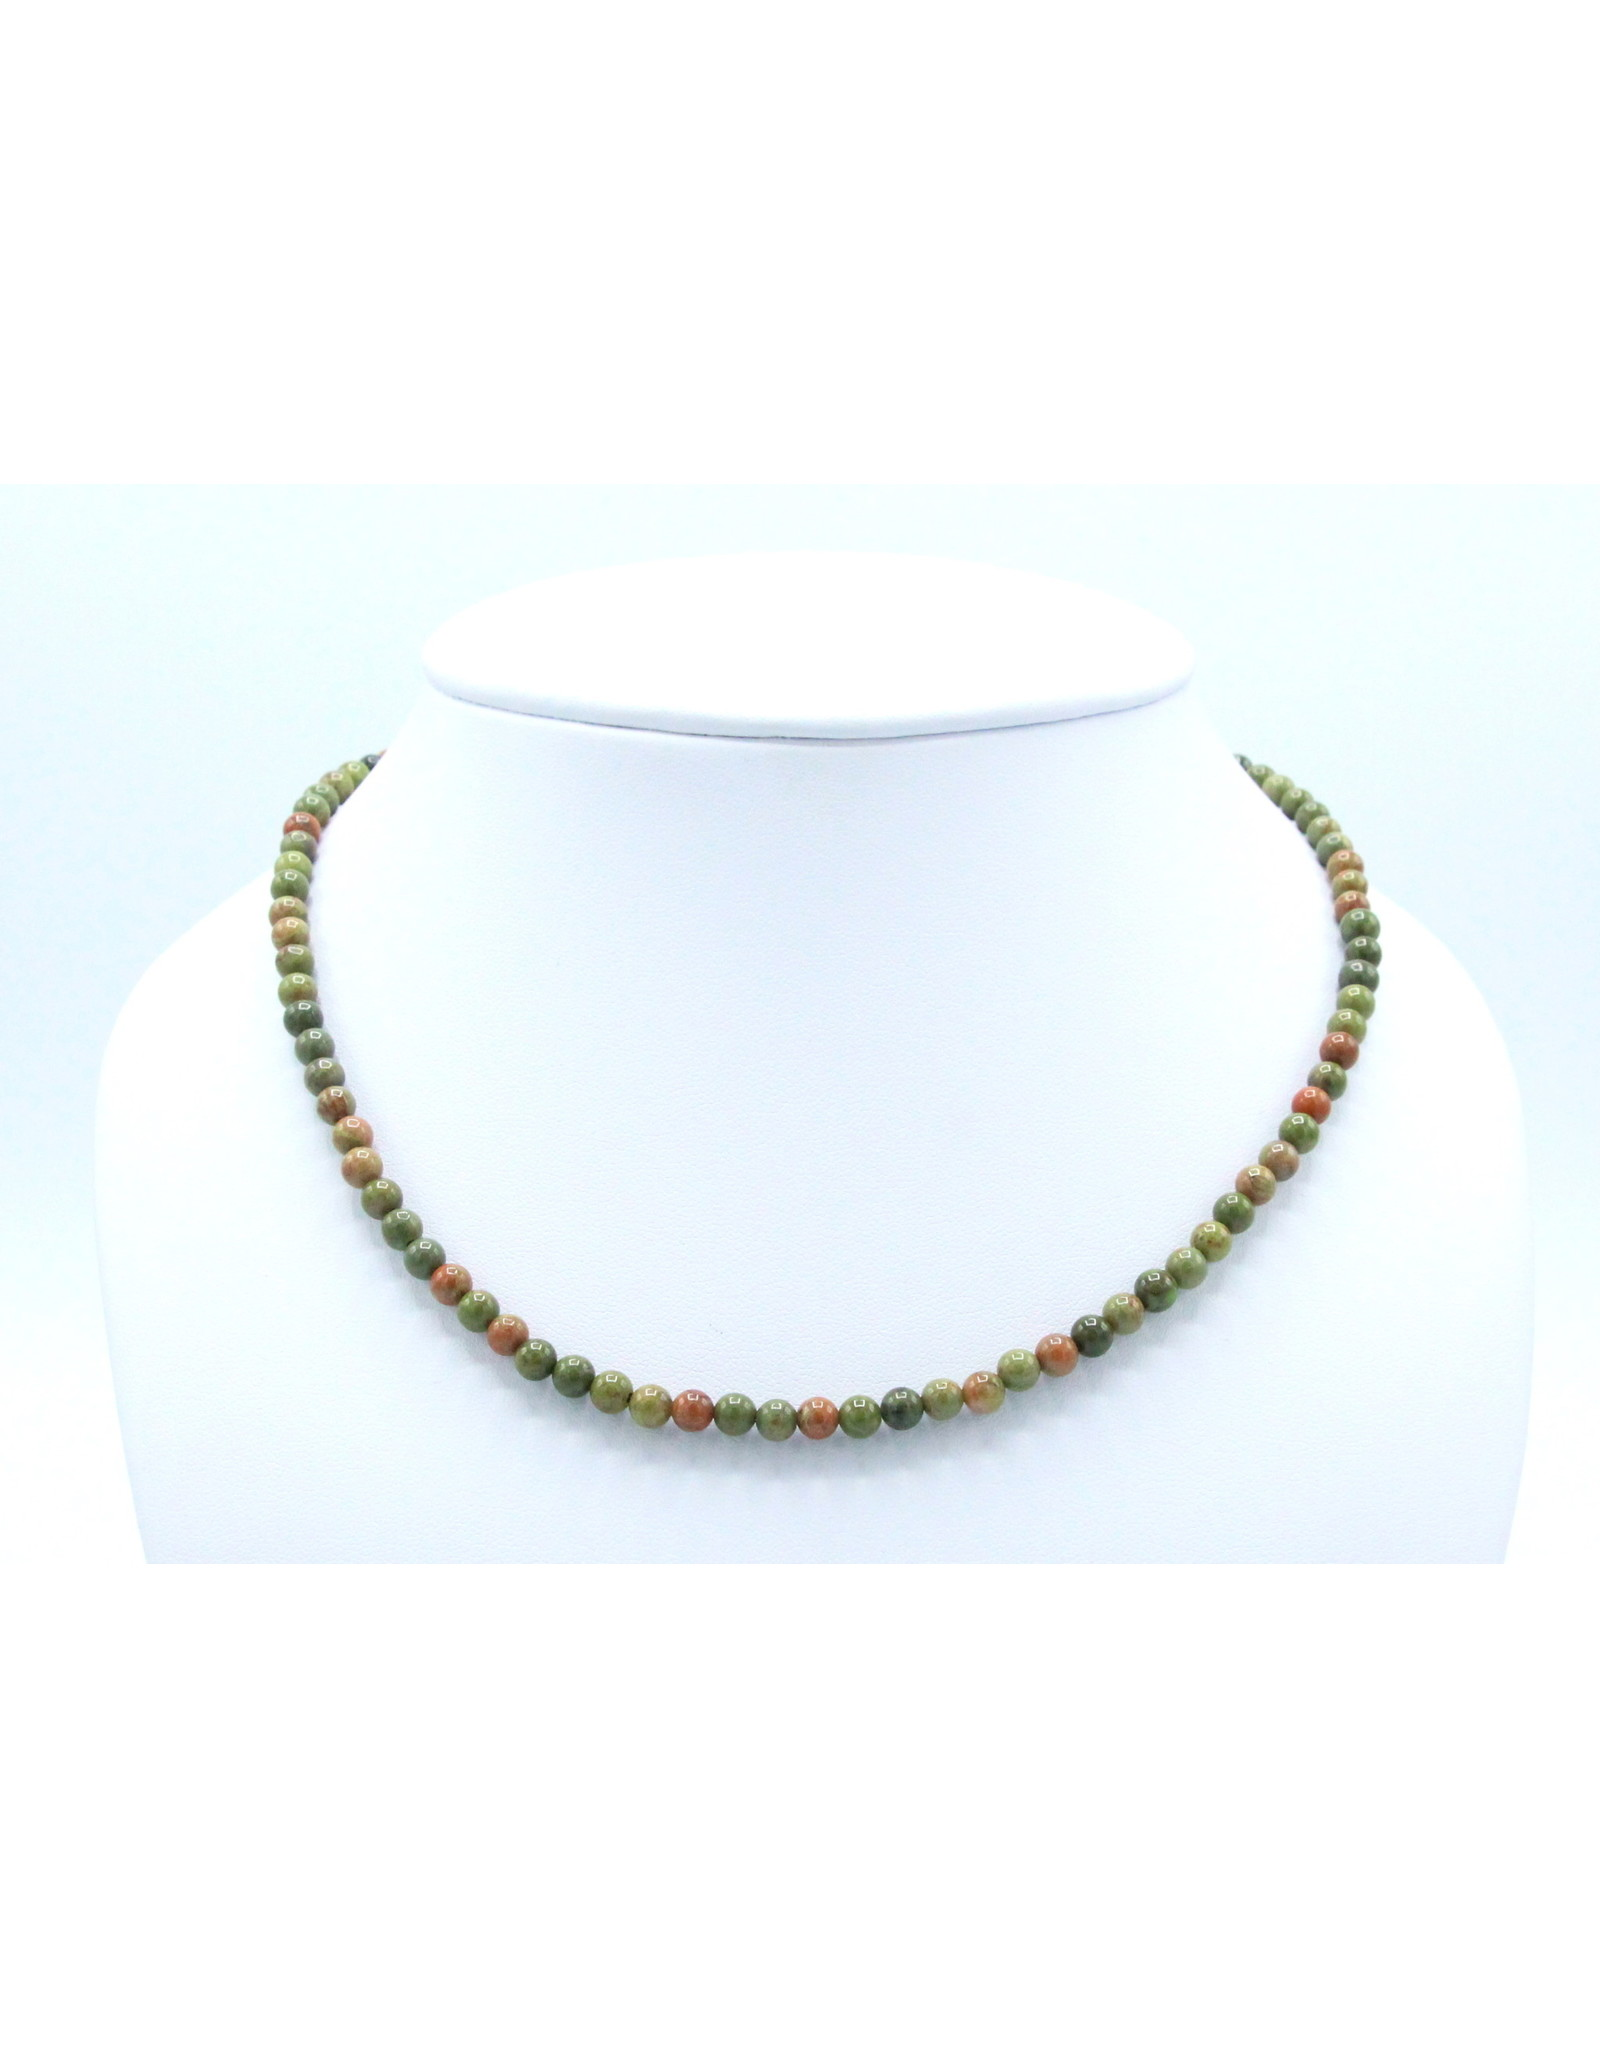 Epidote Necklace - NEPI02